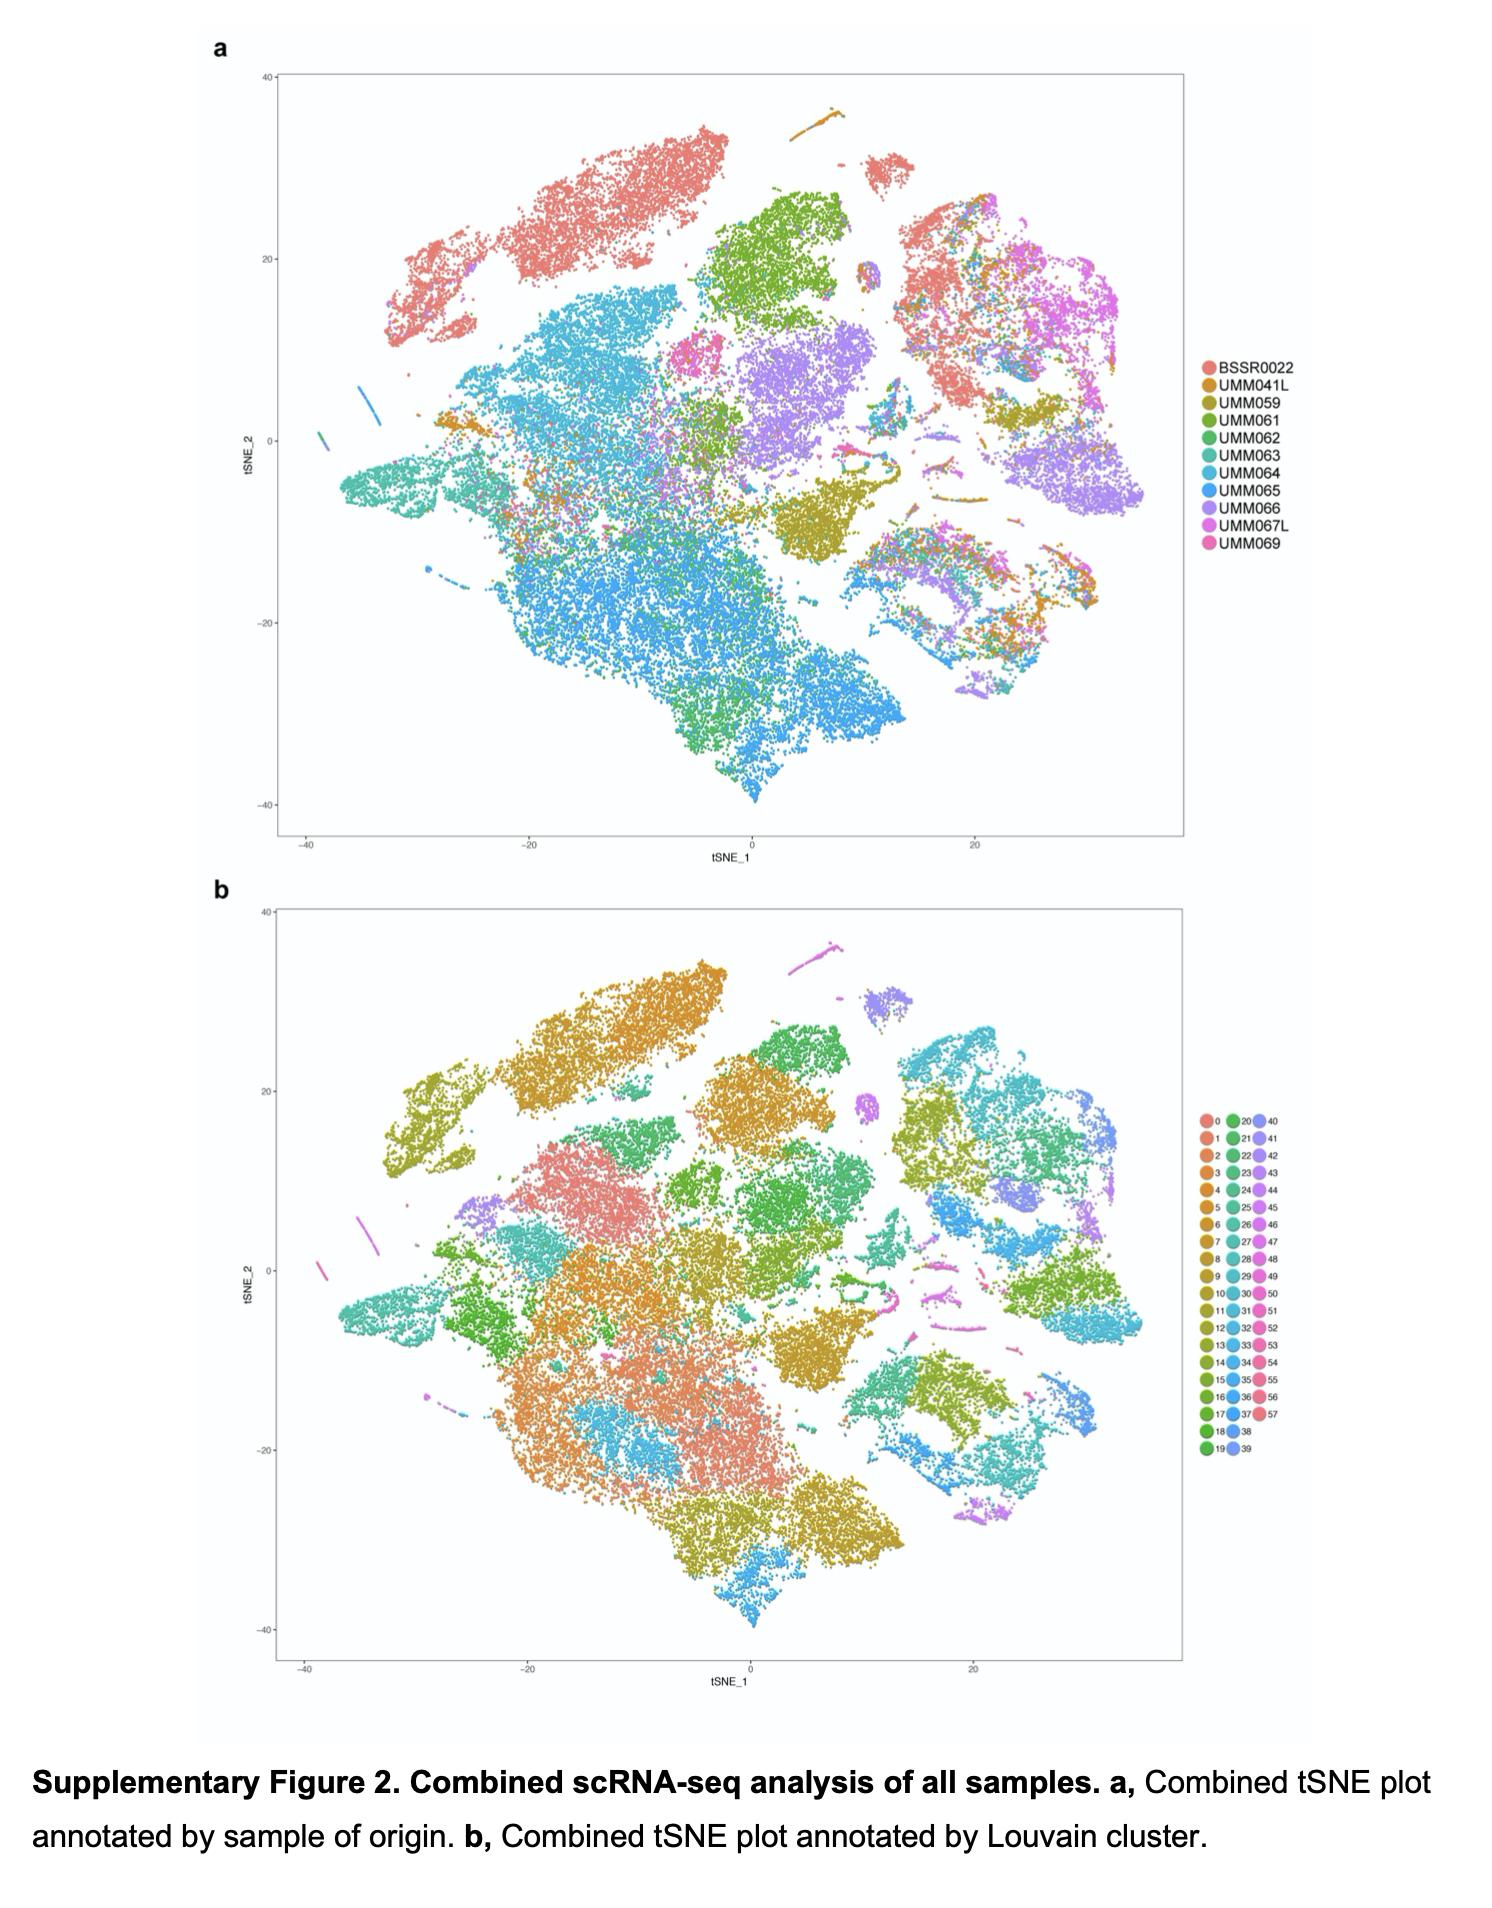 a图按来源划分;b图是全部的cluster